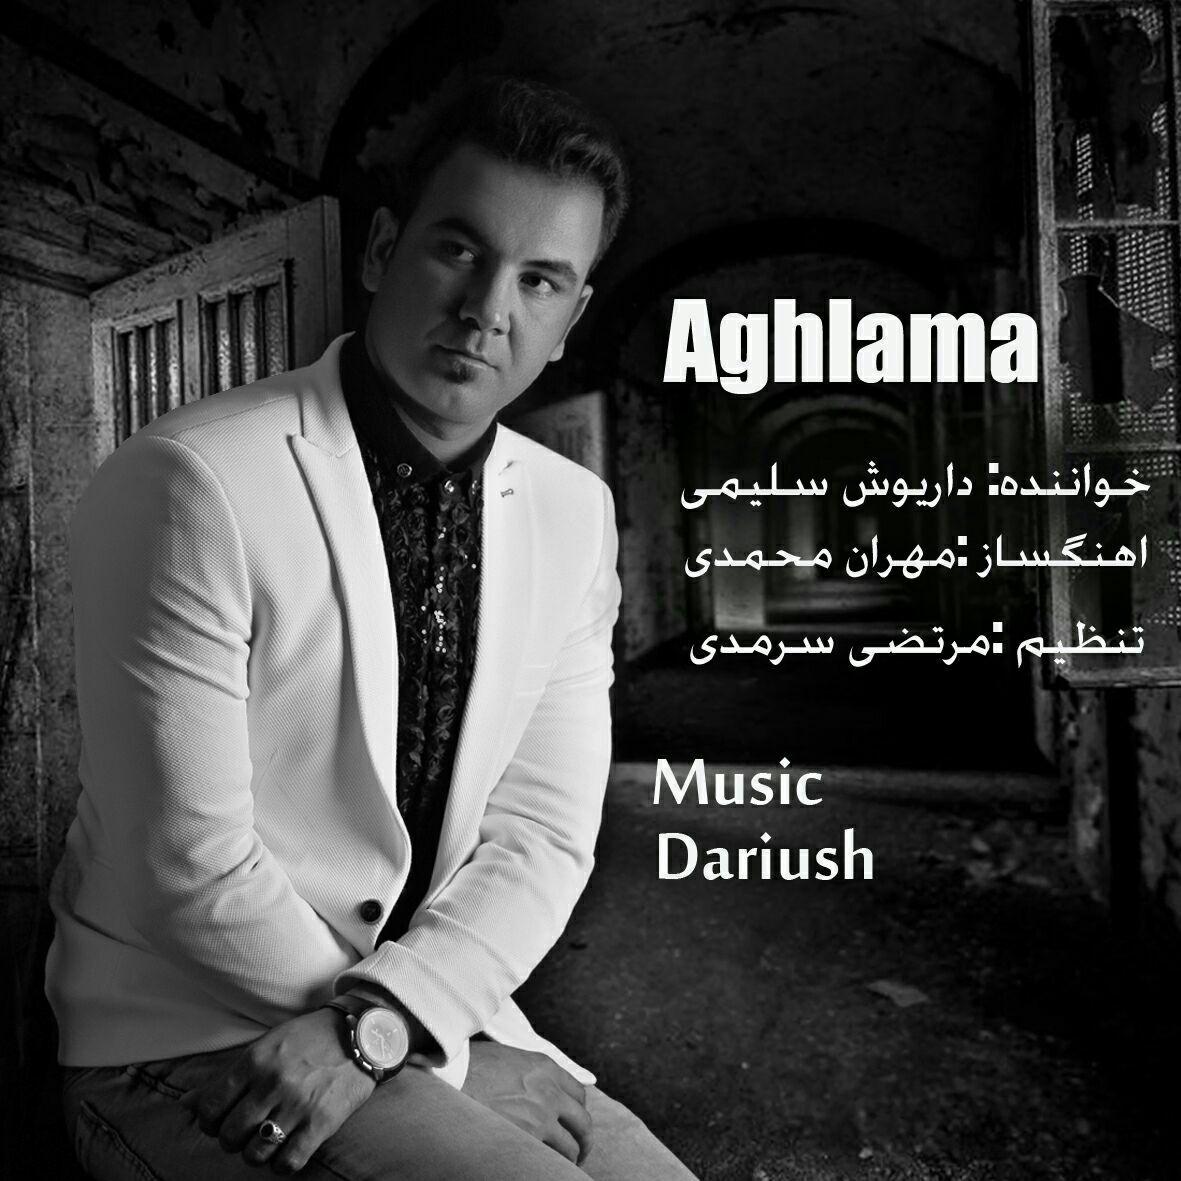 http://s8.picofile.com/file/8303218842/08Dariush_Salimi_Aghlama.jpg